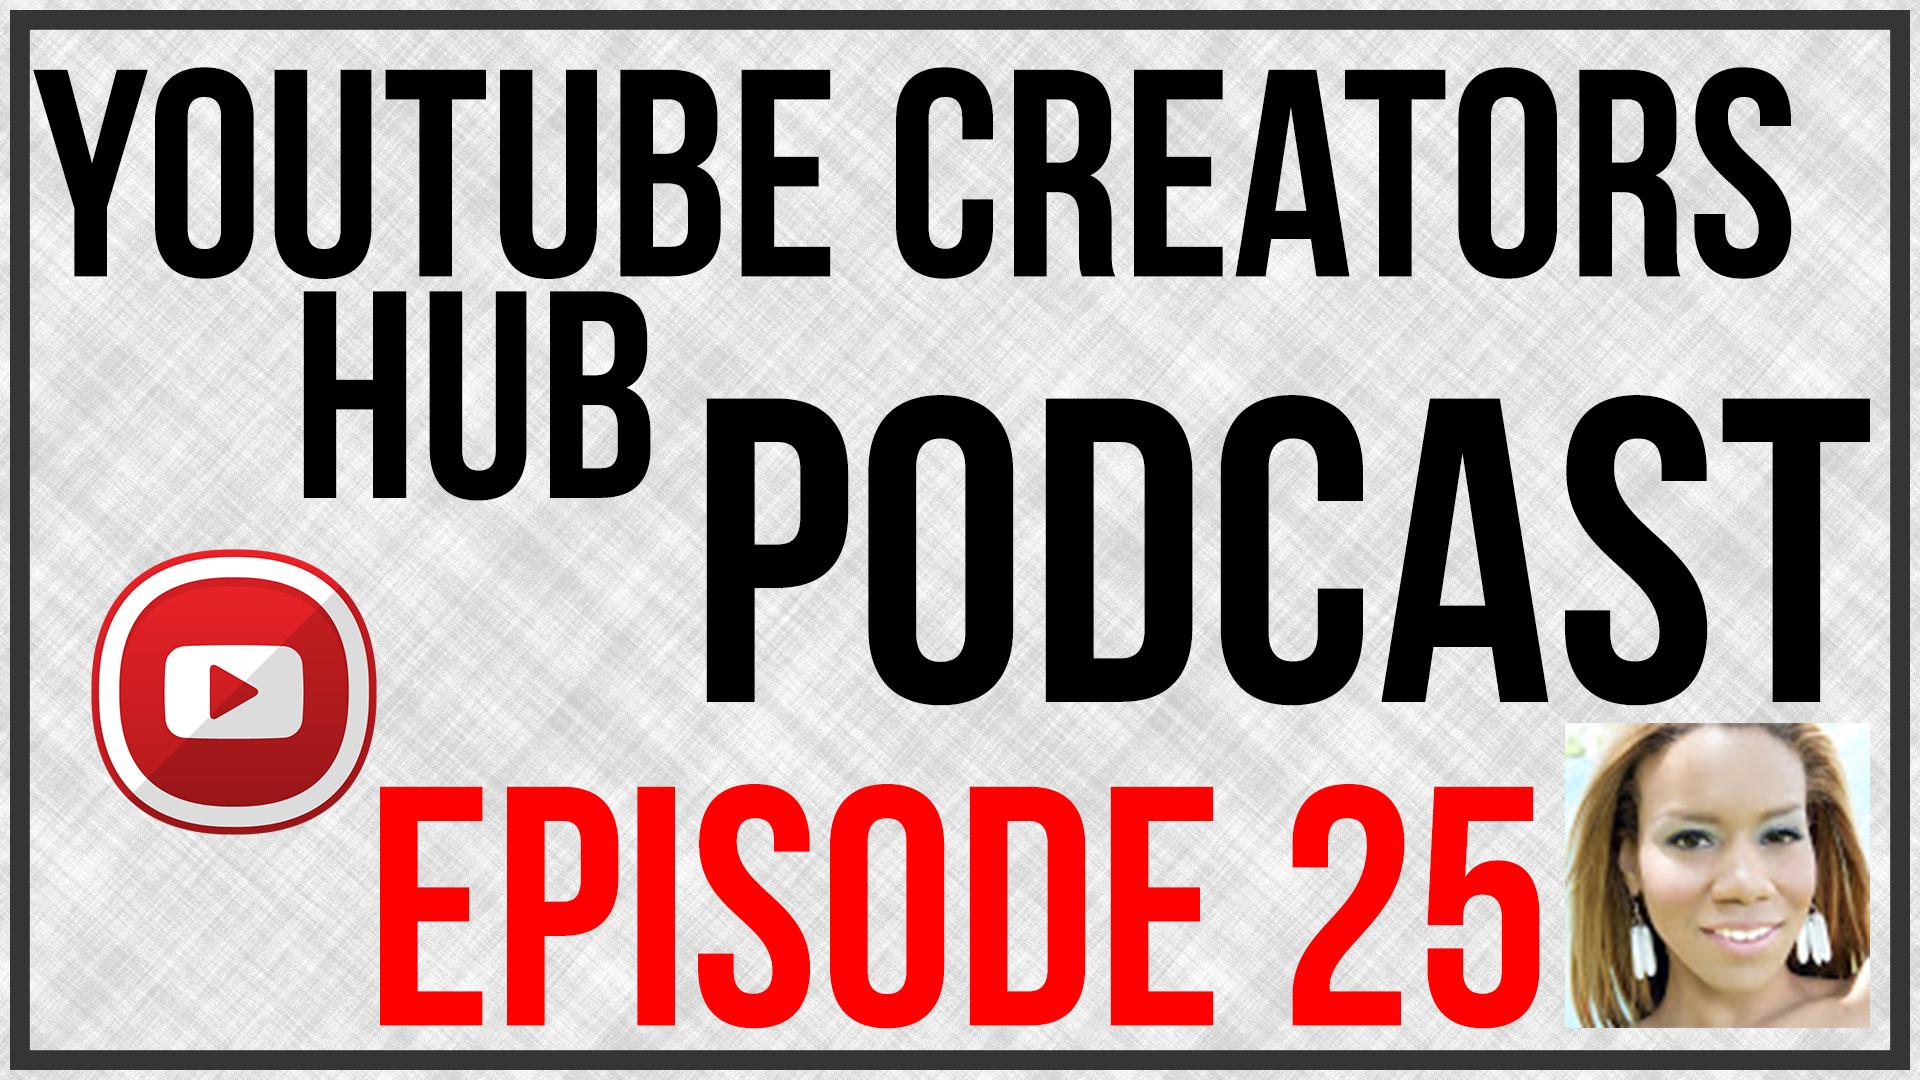 youtube creators hub podcast